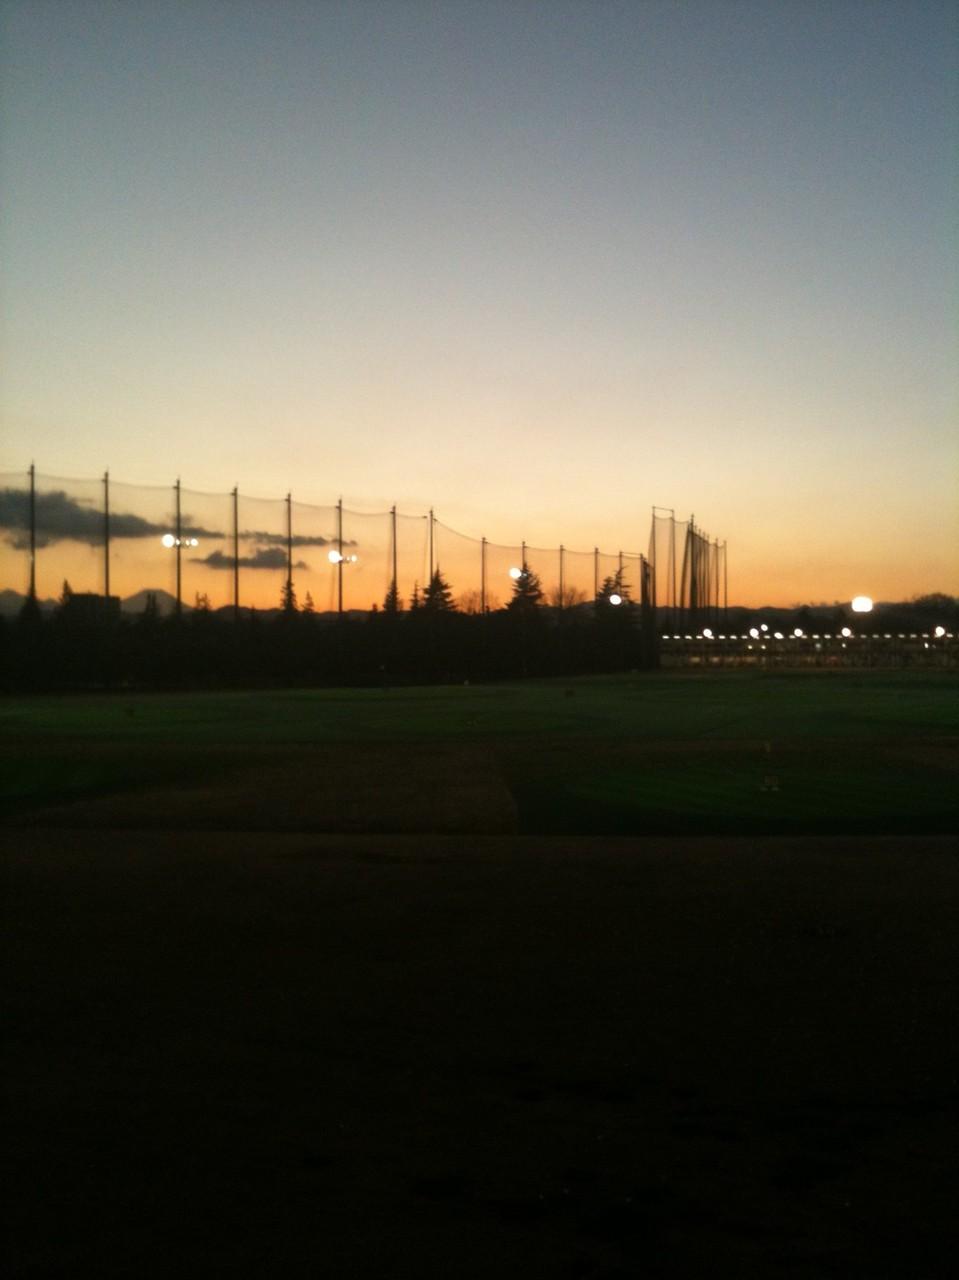 Mt. Fuji Sunset view from Showanomori Golf Drivingrage Tokyo Akishima